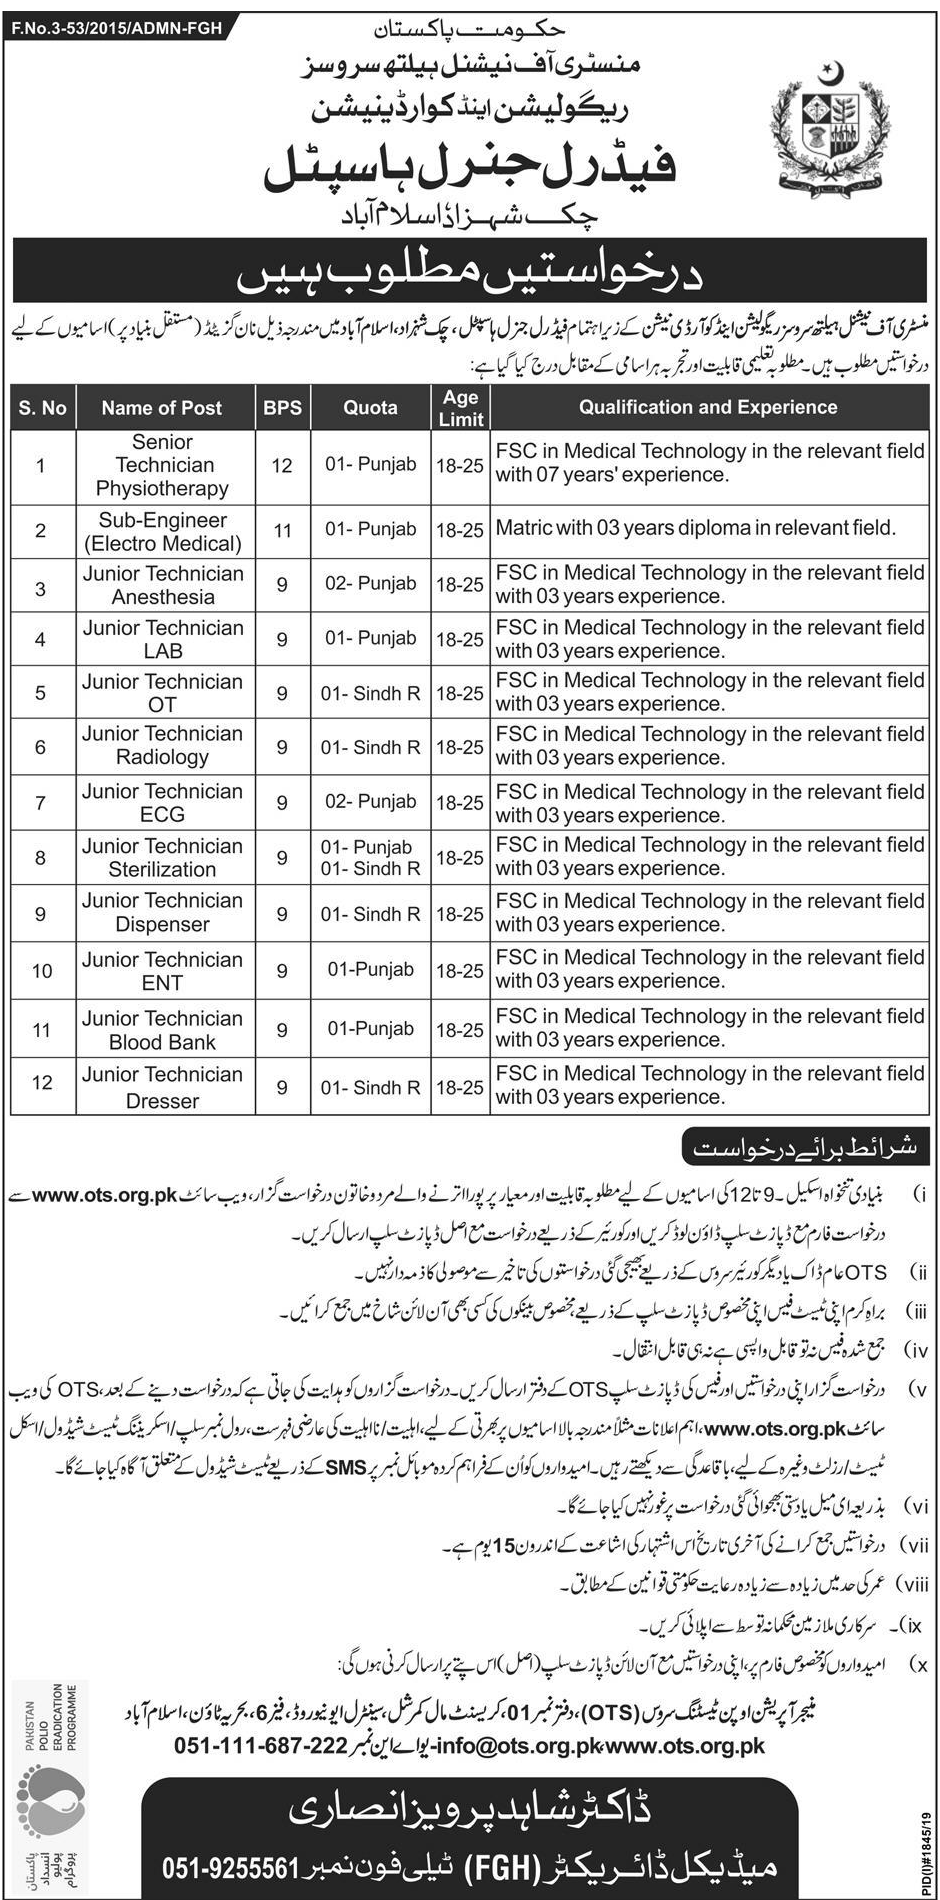 Federal General Hospital Chak Shahzad Islamabad Jobs Via OTS